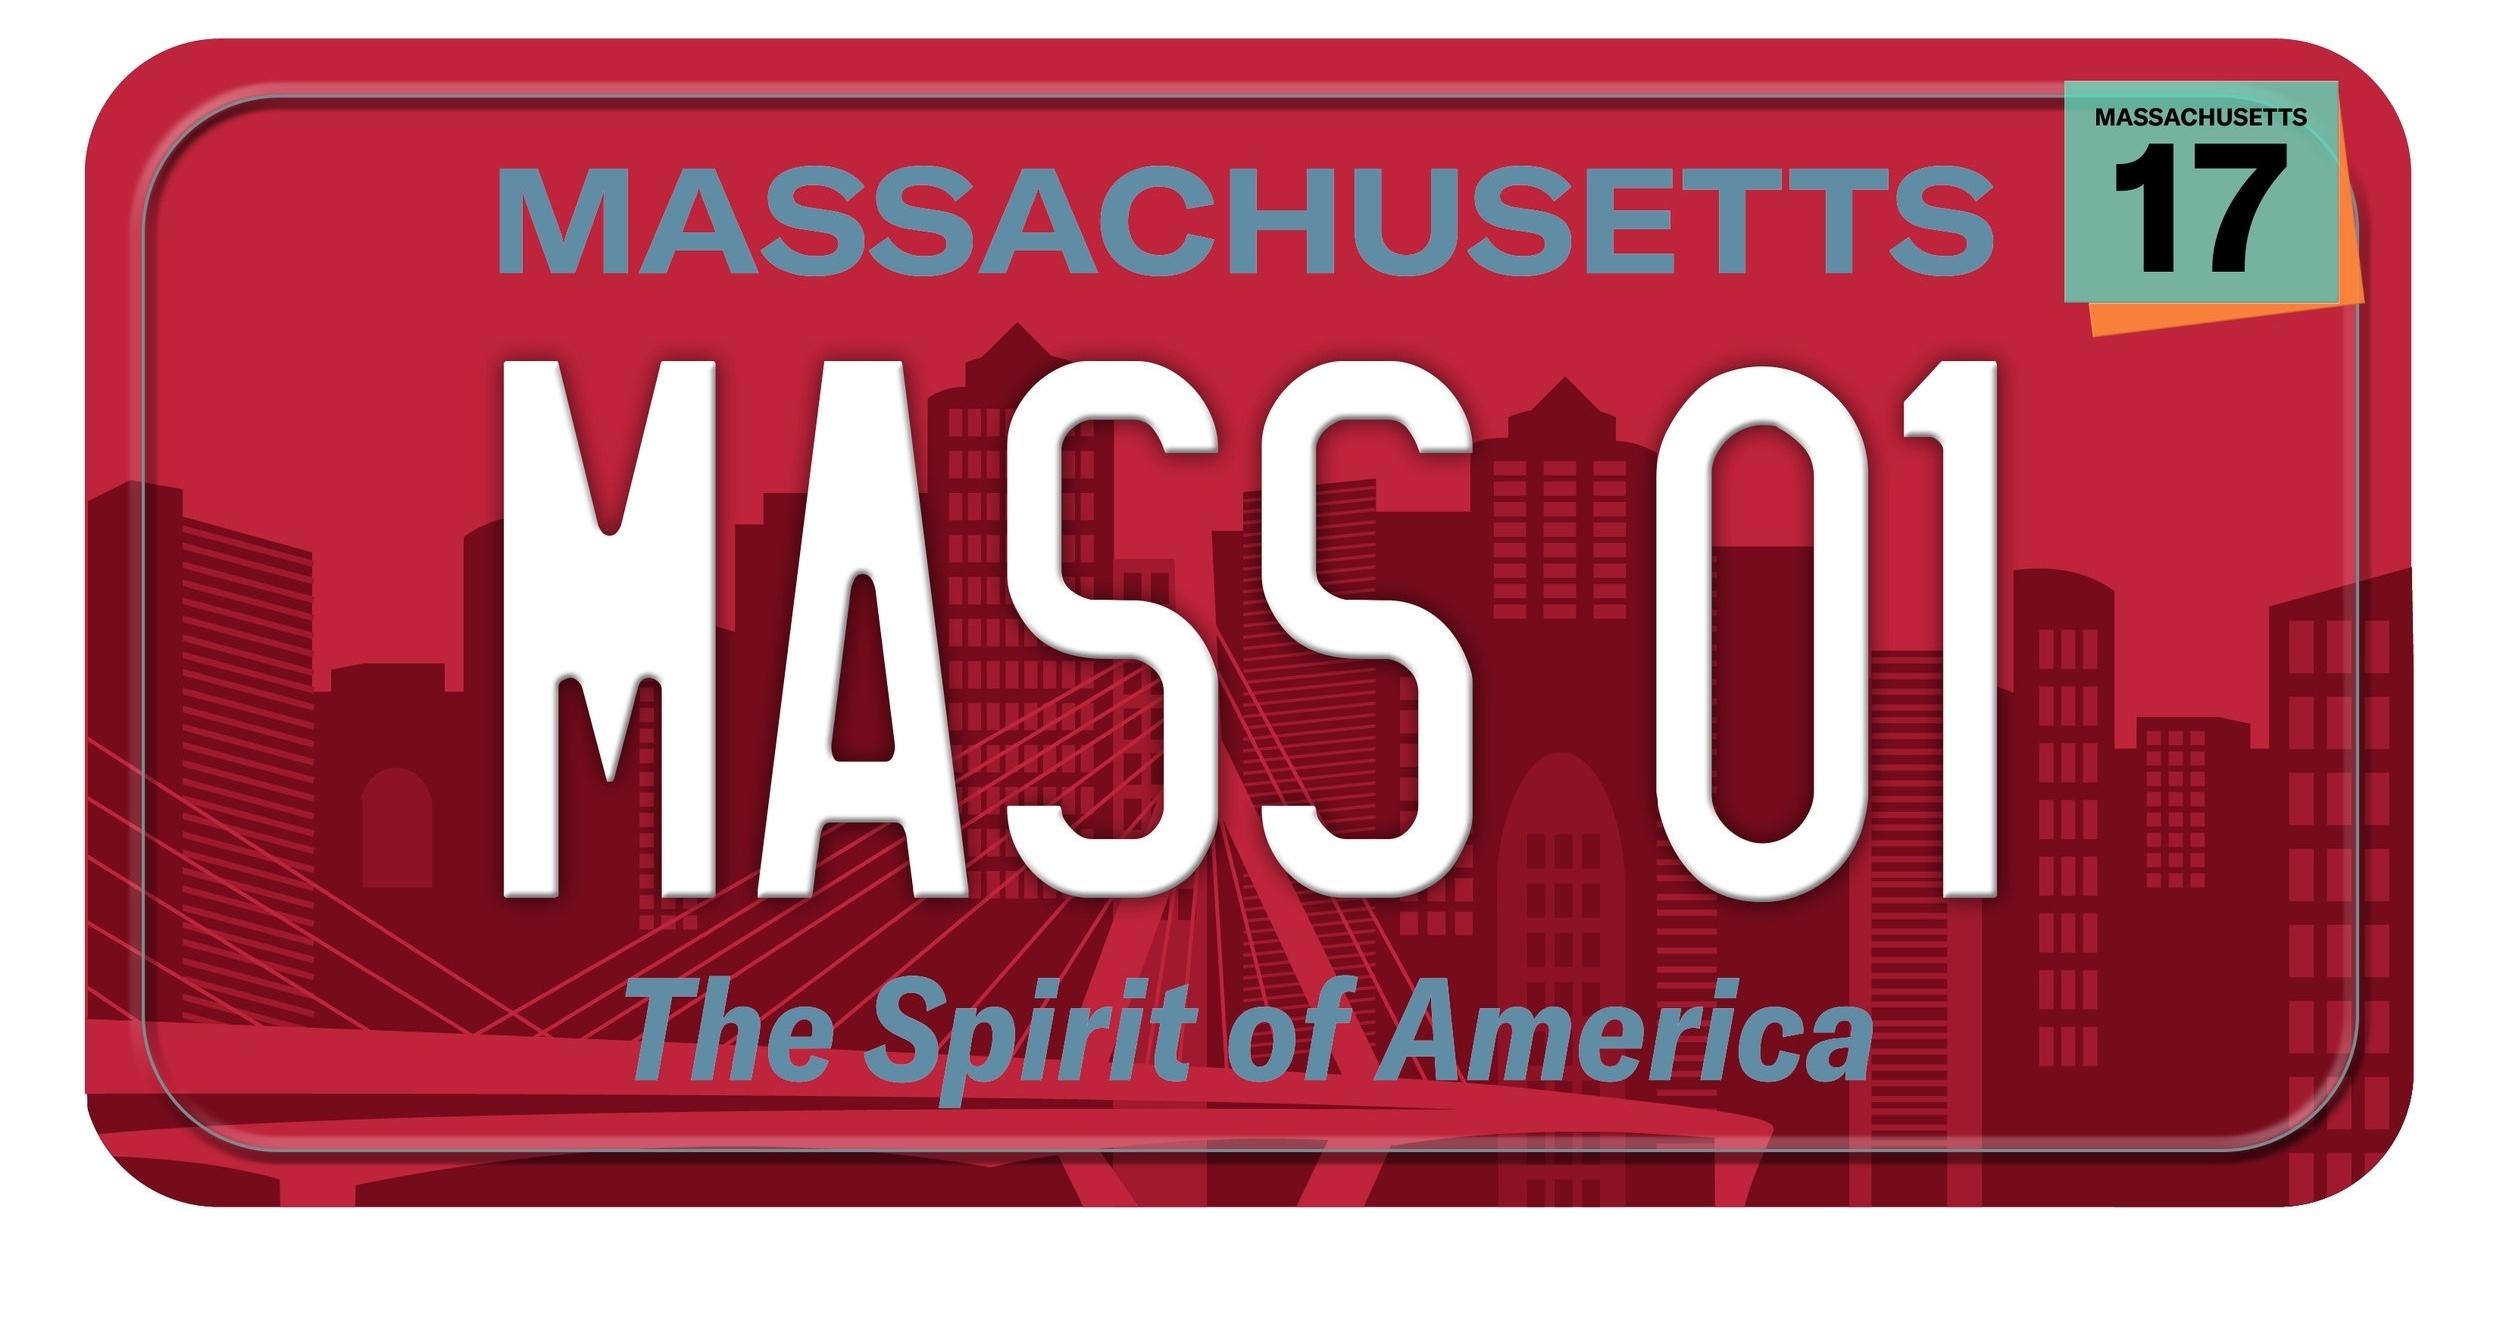 licenseplate2.jpg